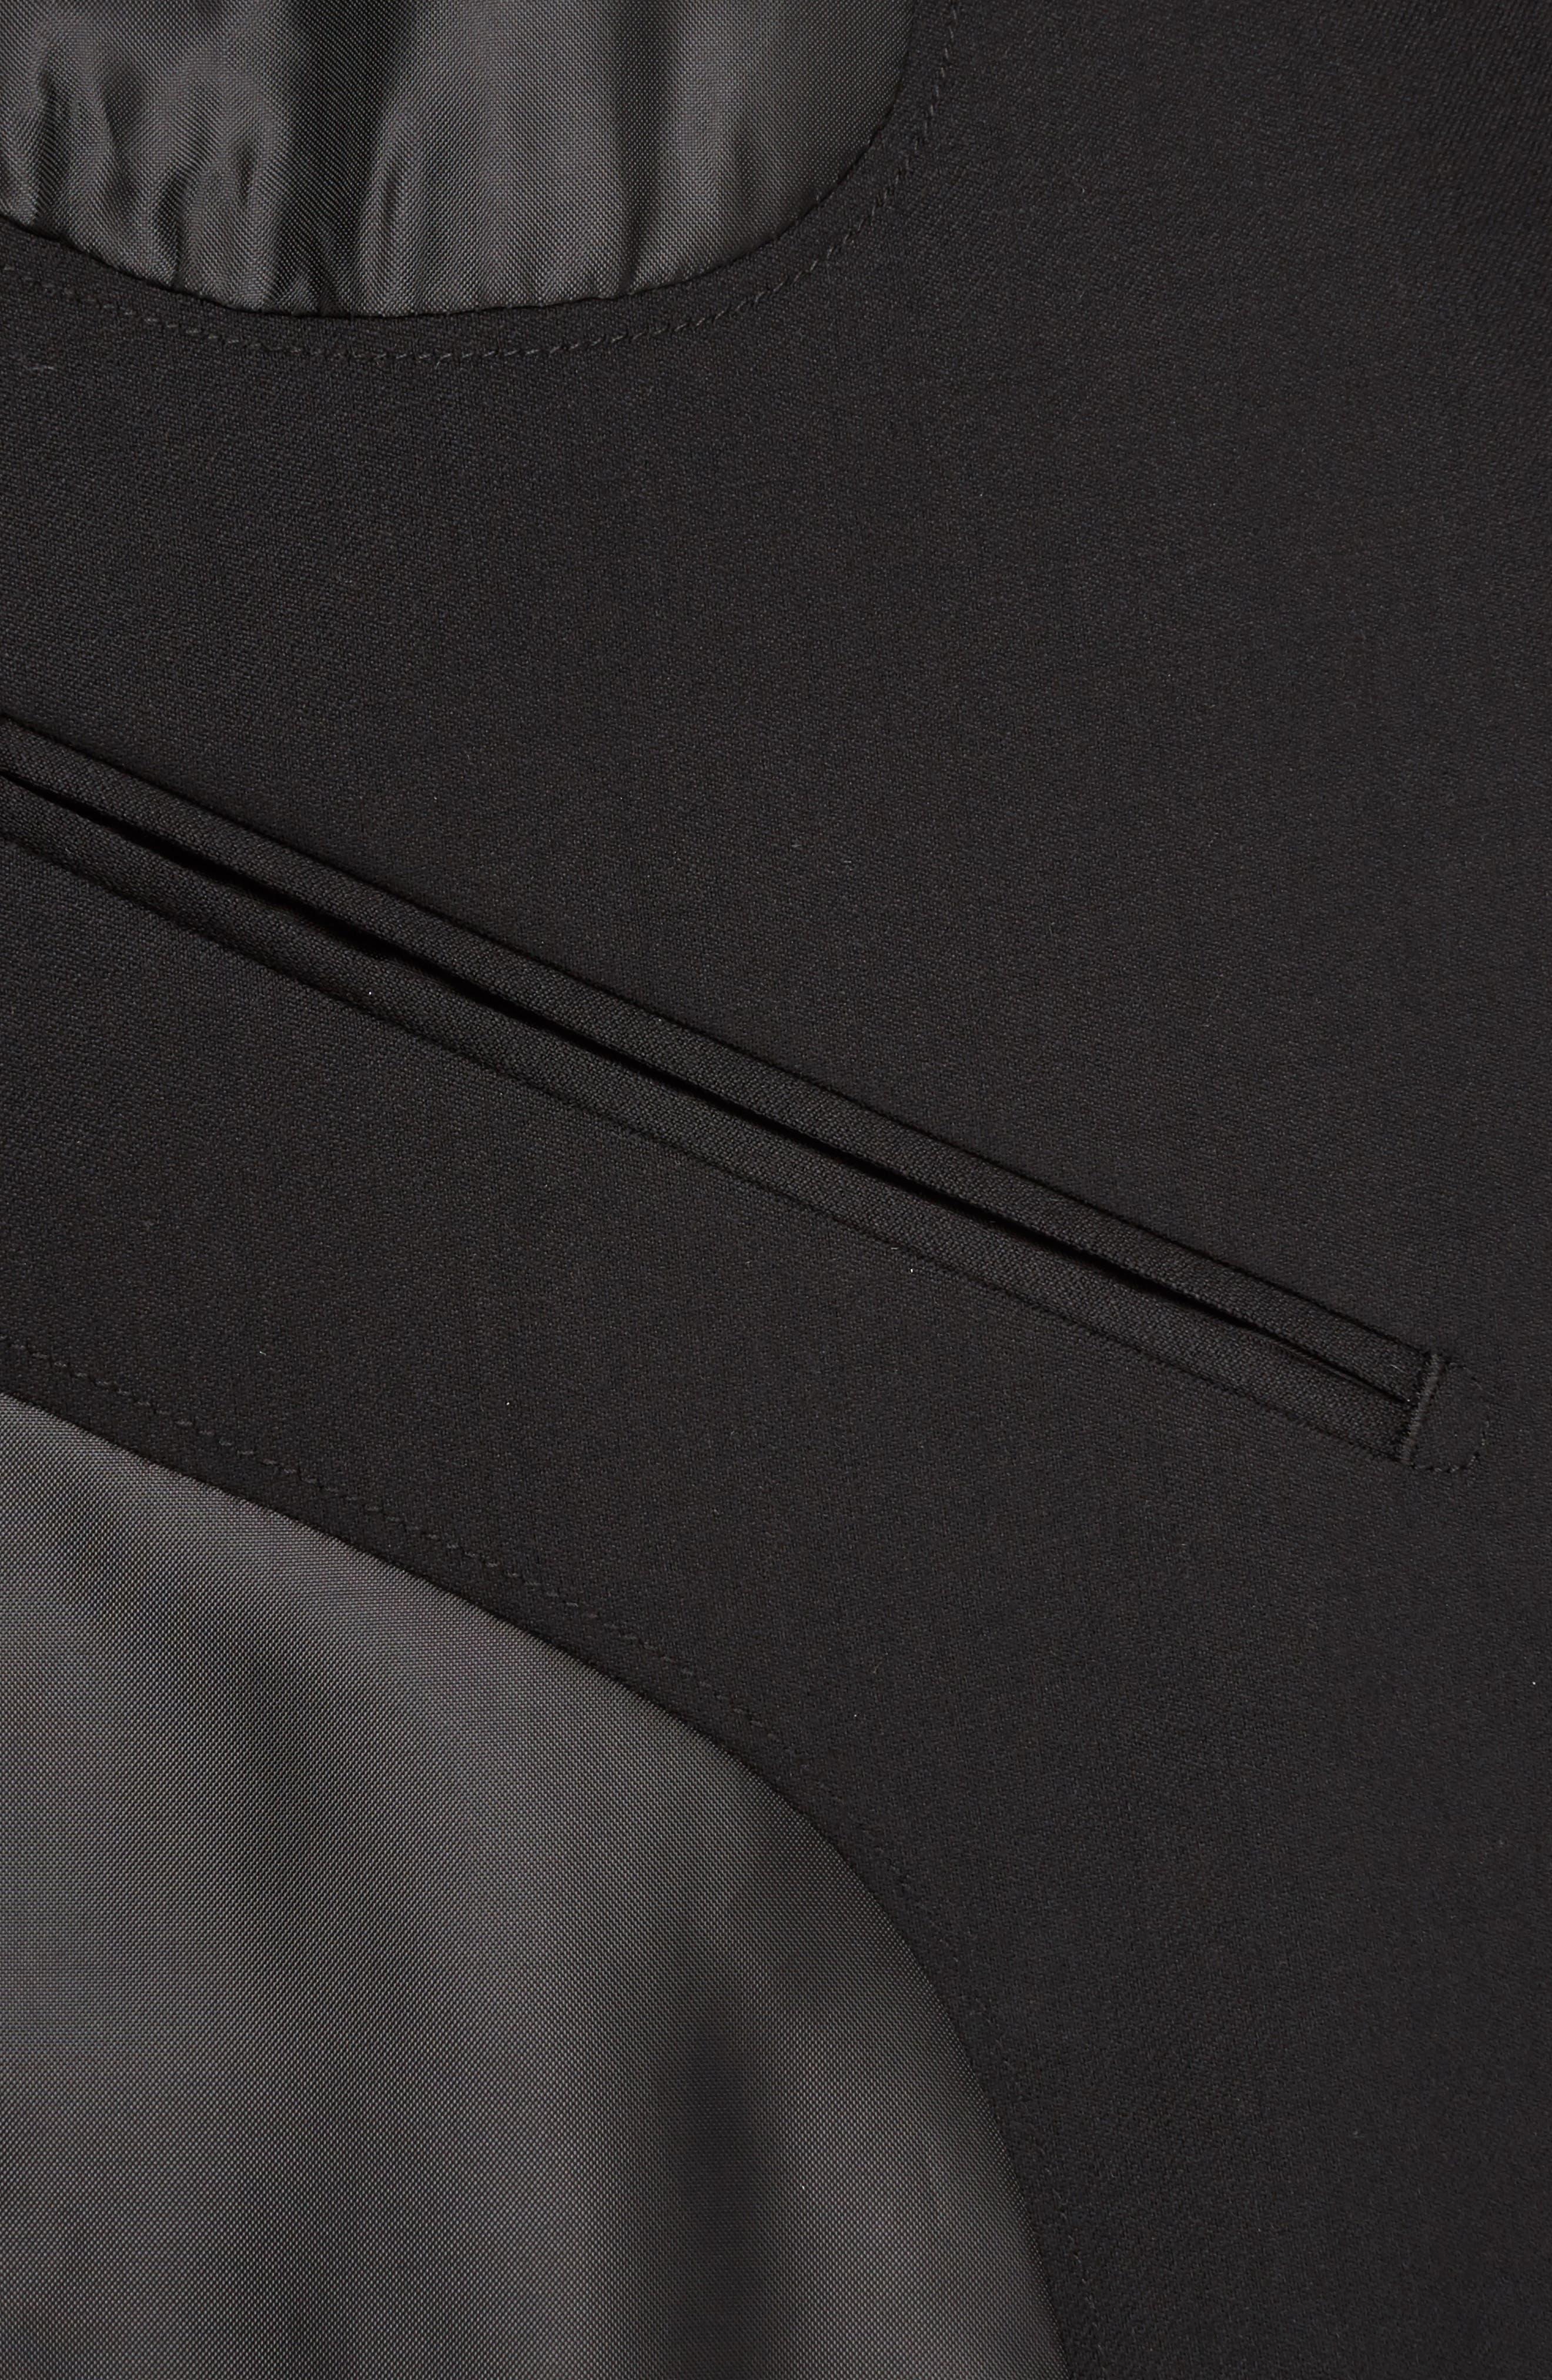 Jetsetter Trim Fit Stretch Wool Suit Jacket,                             Alternate thumbnail 4, color,                             Black